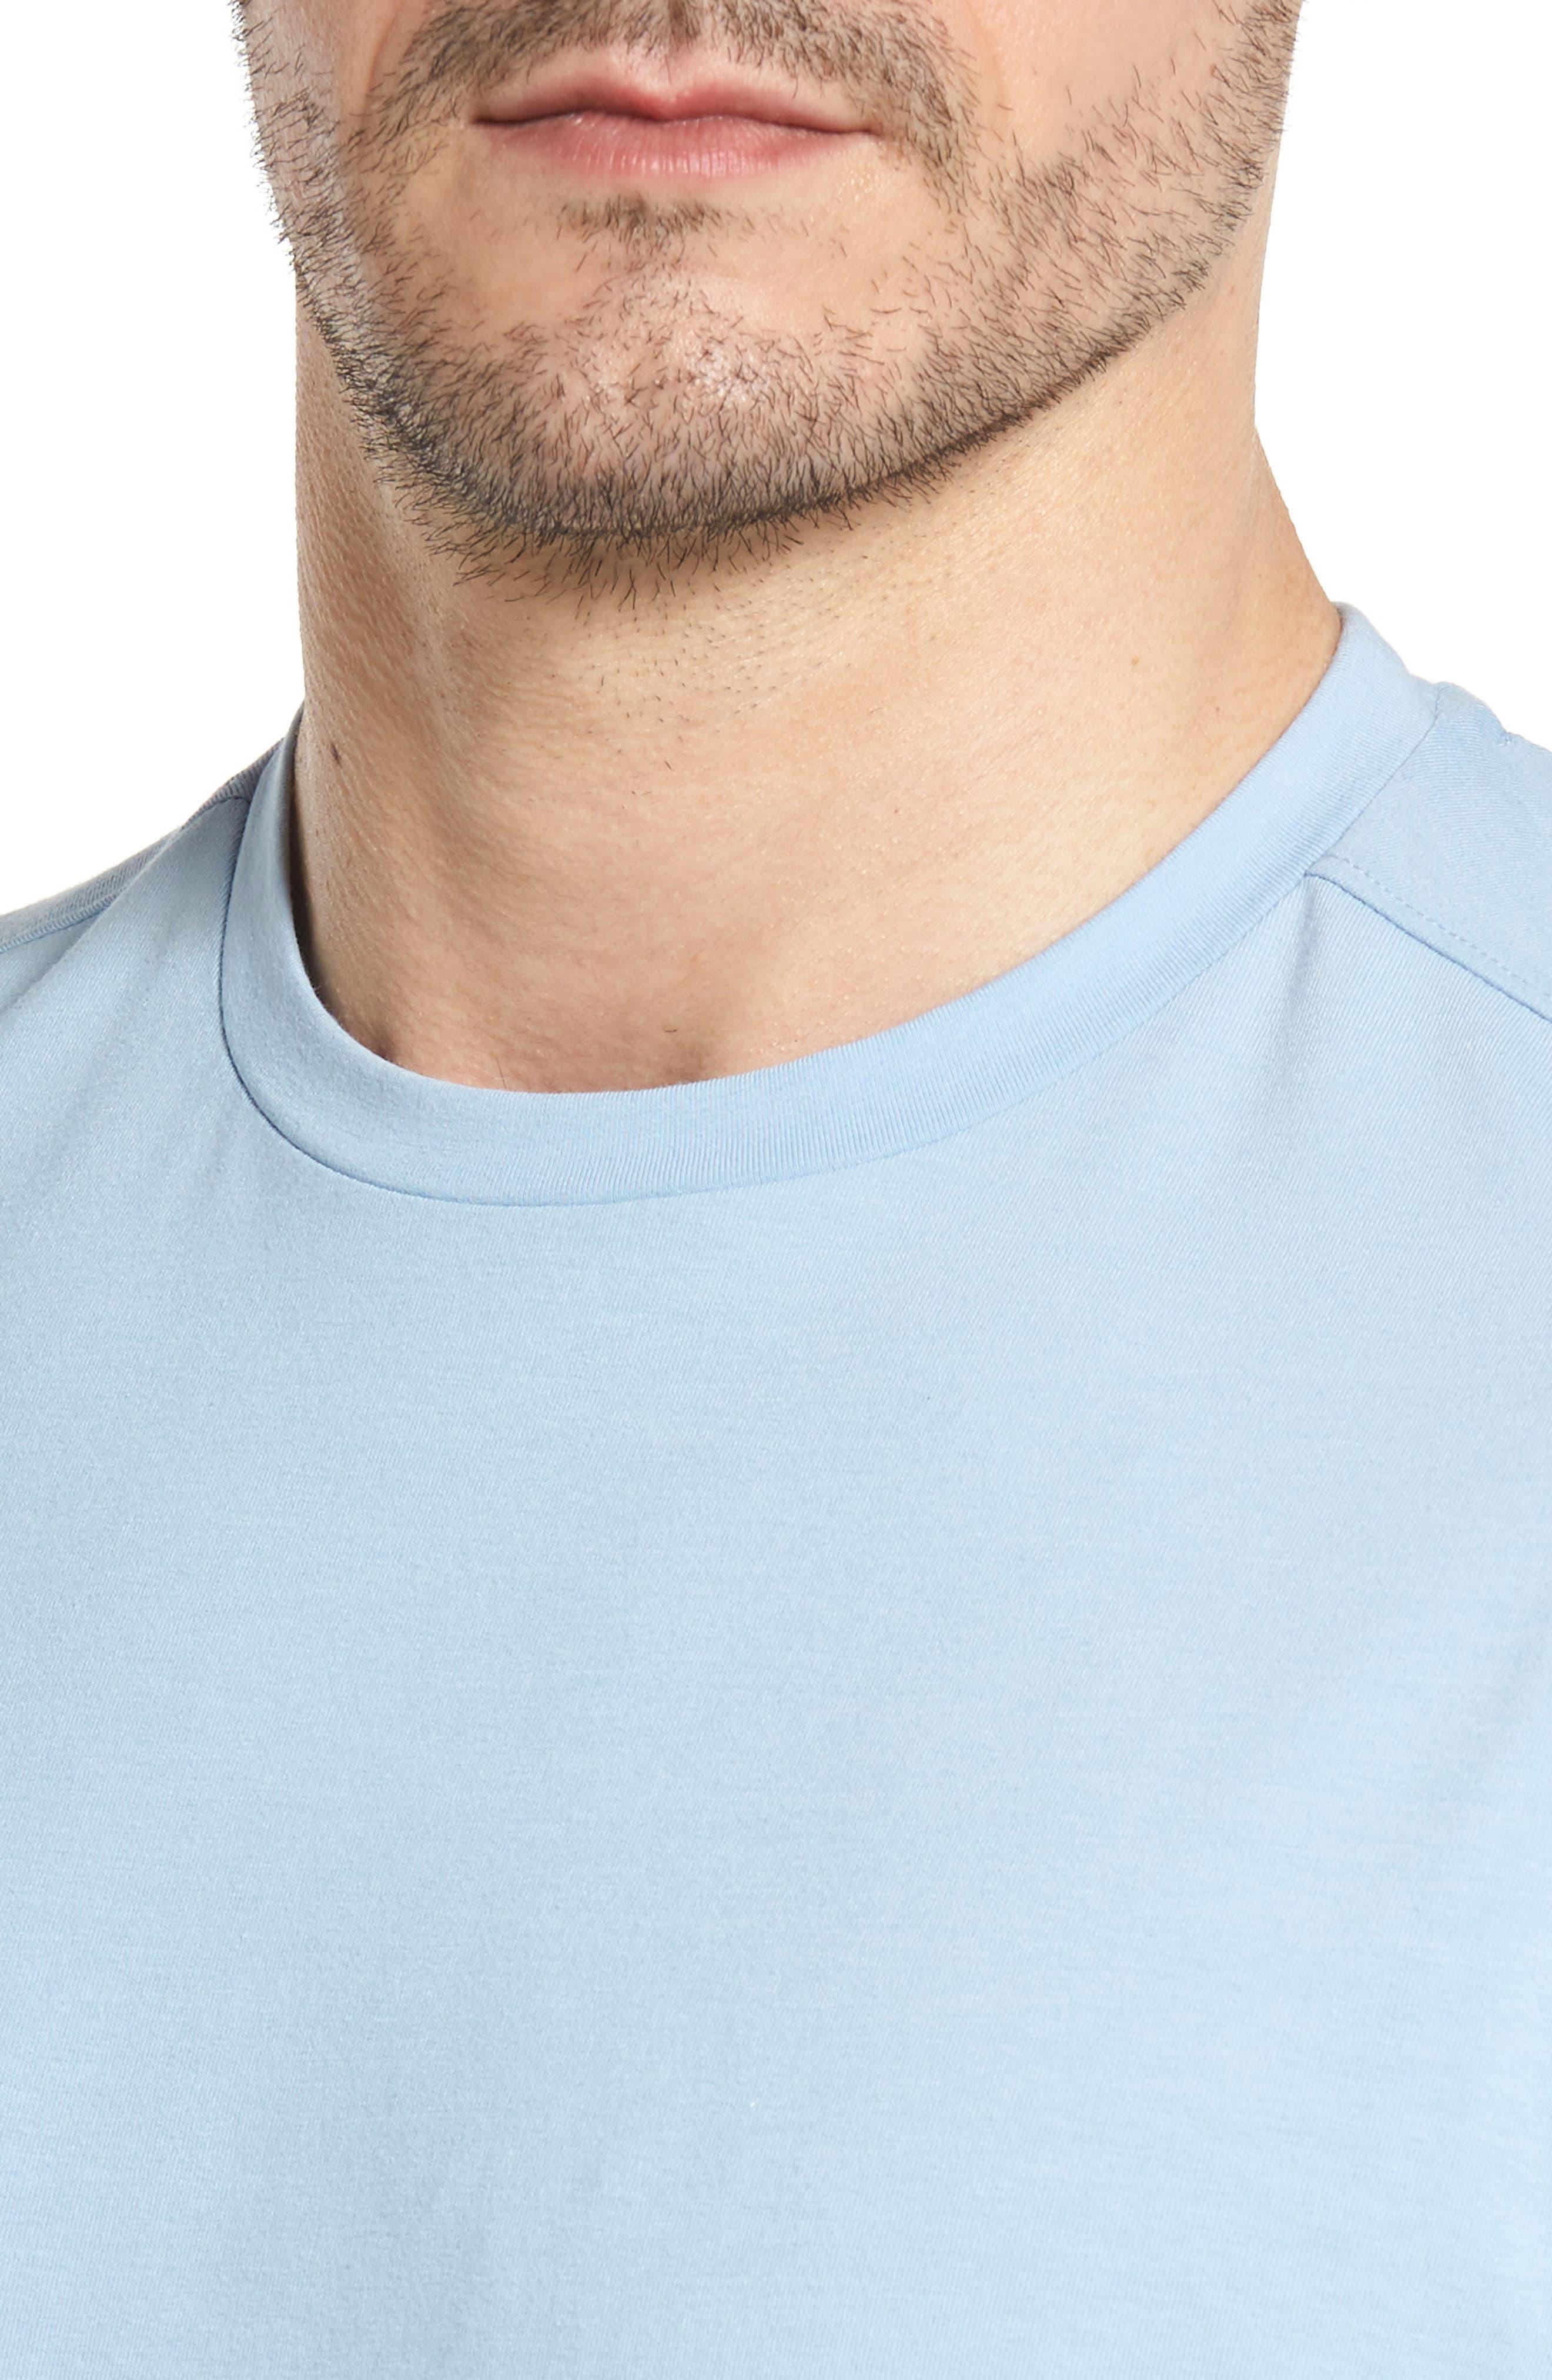 Tropicool T-Shirt,                             Alternate thumbnail 36, color,